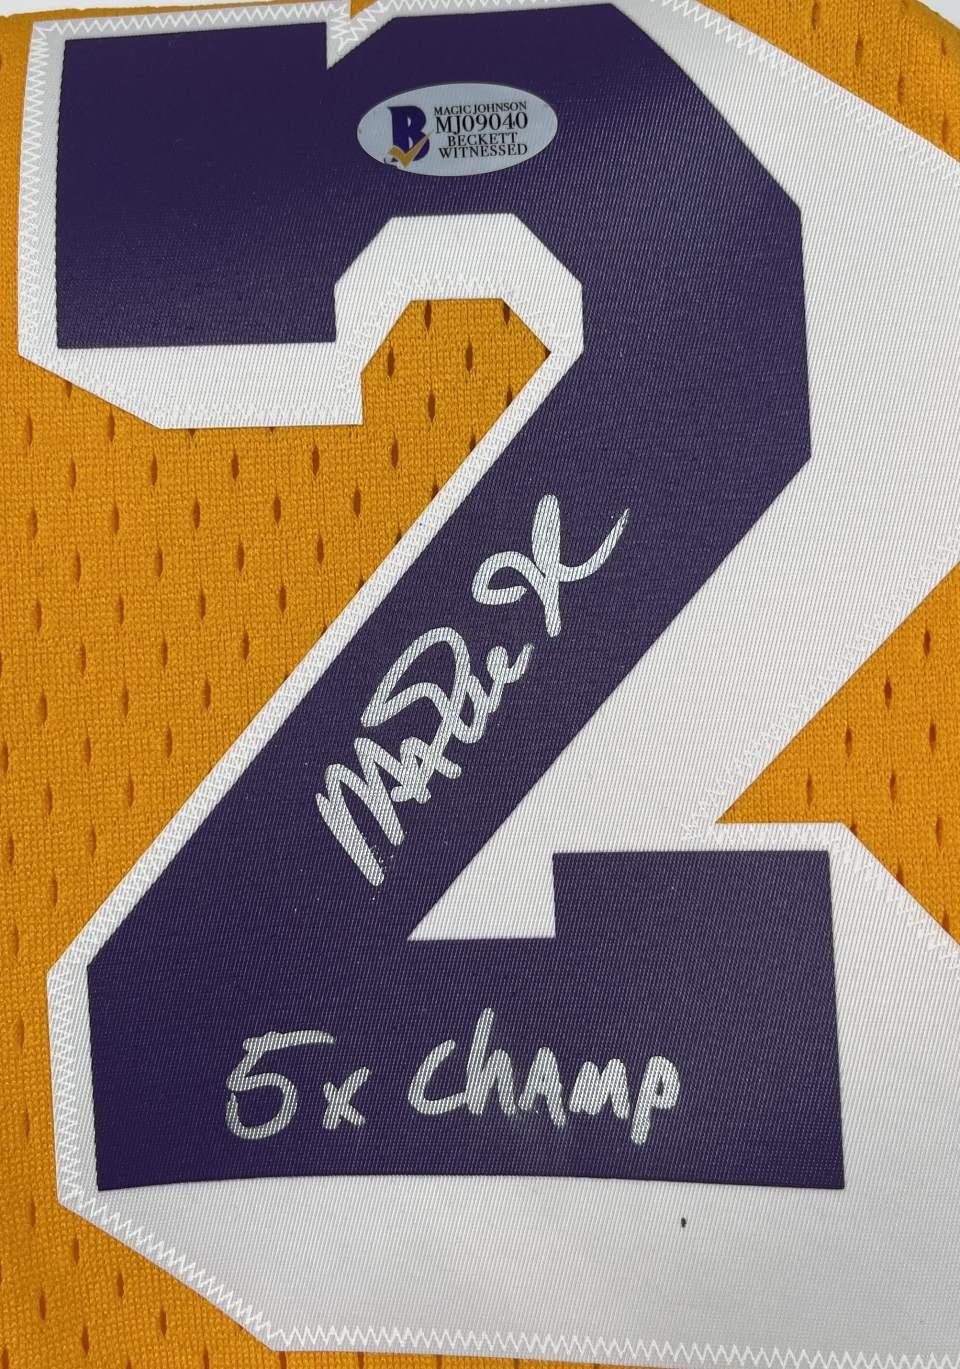 "Lakers Magic Johnson ""5x Champ"" Signed 84-85 M&N HWC Swingman Yellow Jersey [BAS MJ09040]"